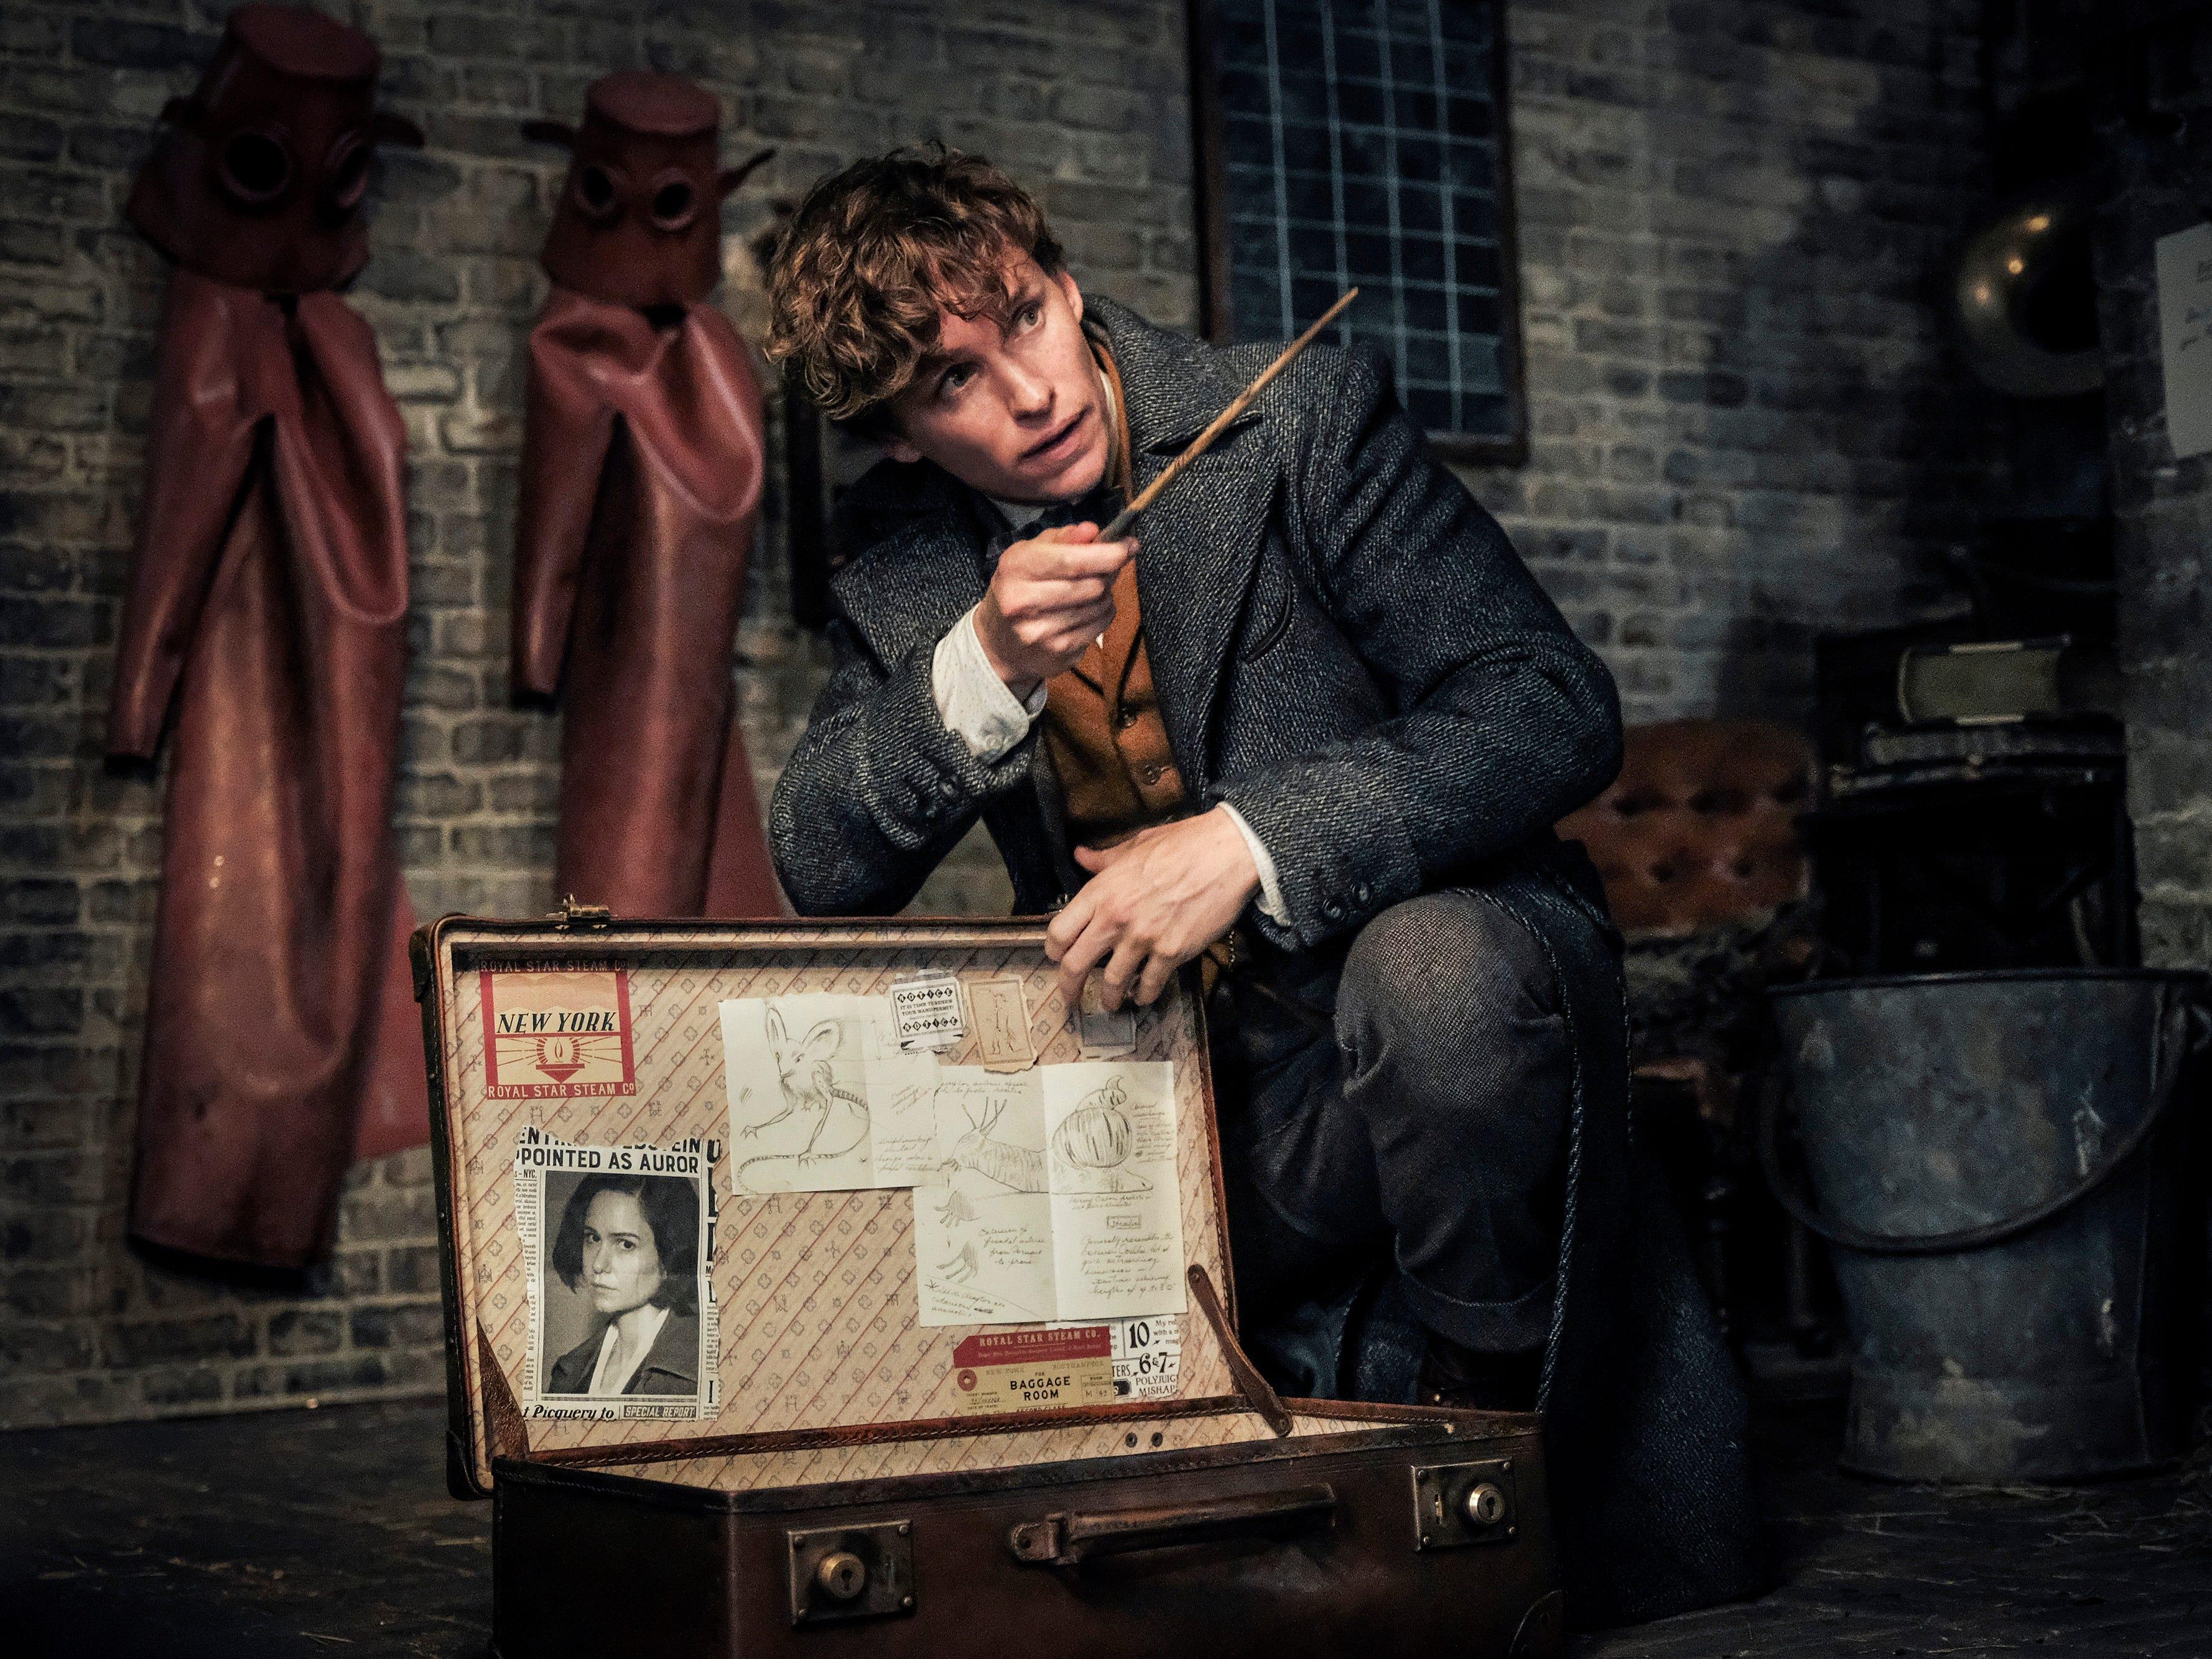 Review: Darker, bolder 'Fantastic Beasts' sequel goes all in on Johnny Depp, 'Potter' magic